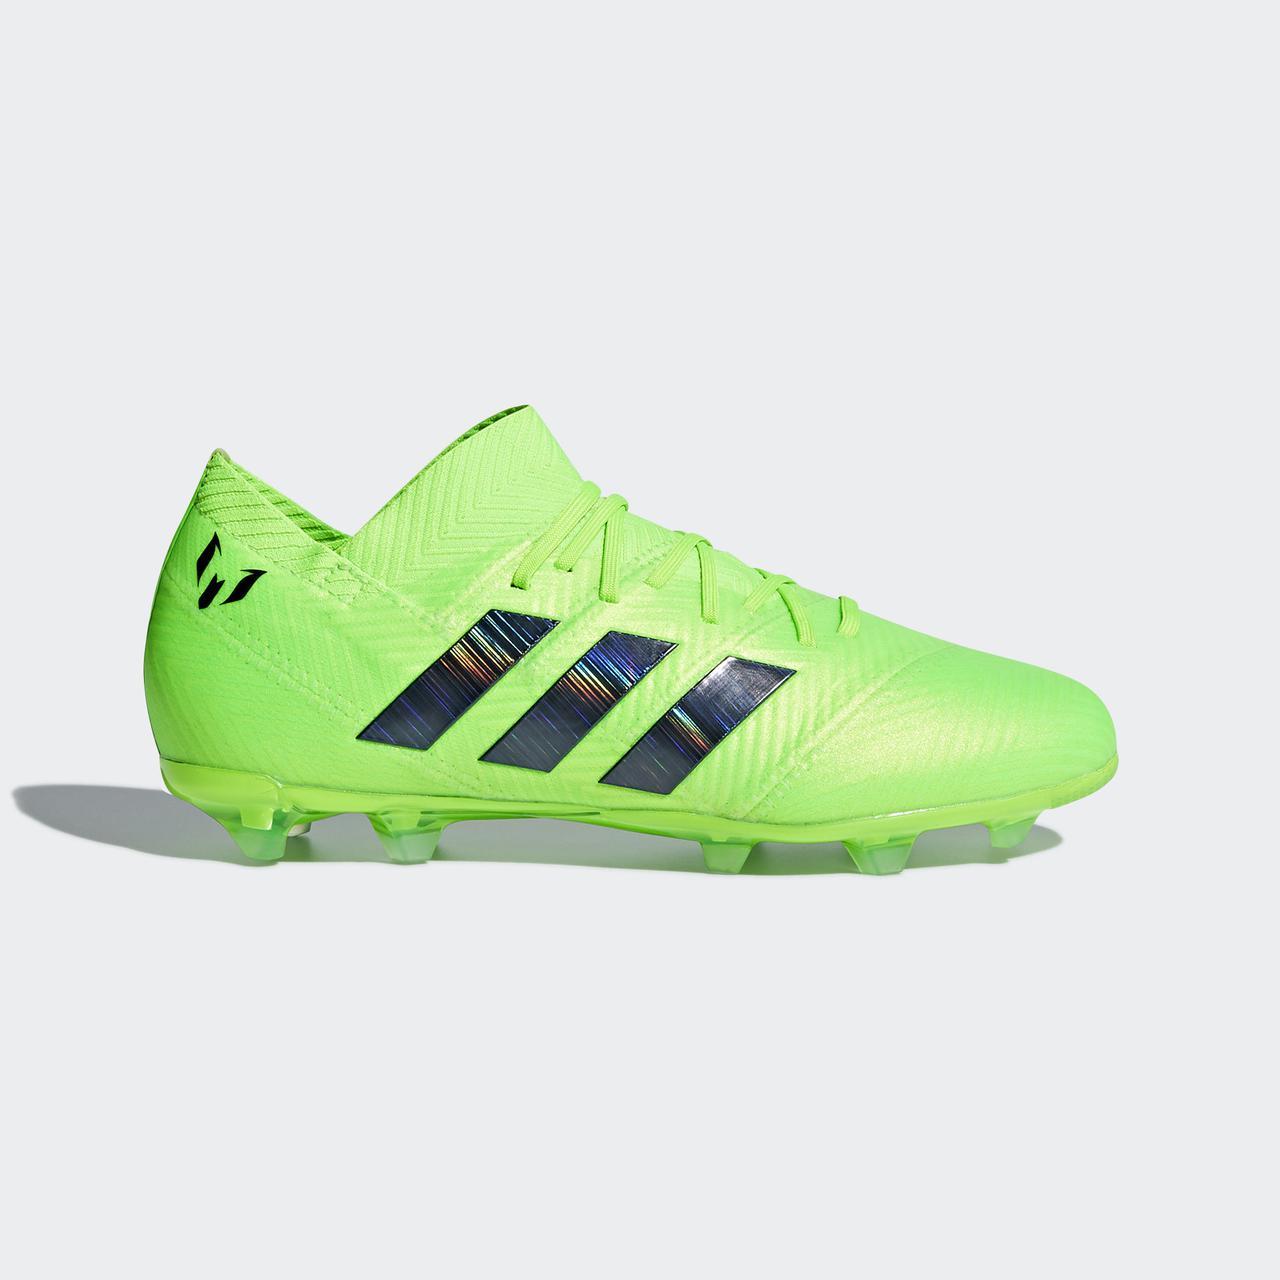 e80283f99955 Детские футбольные бутсы Adidas Performance Nemeziz Messi 18.1 FG (Артикул   DB2361)